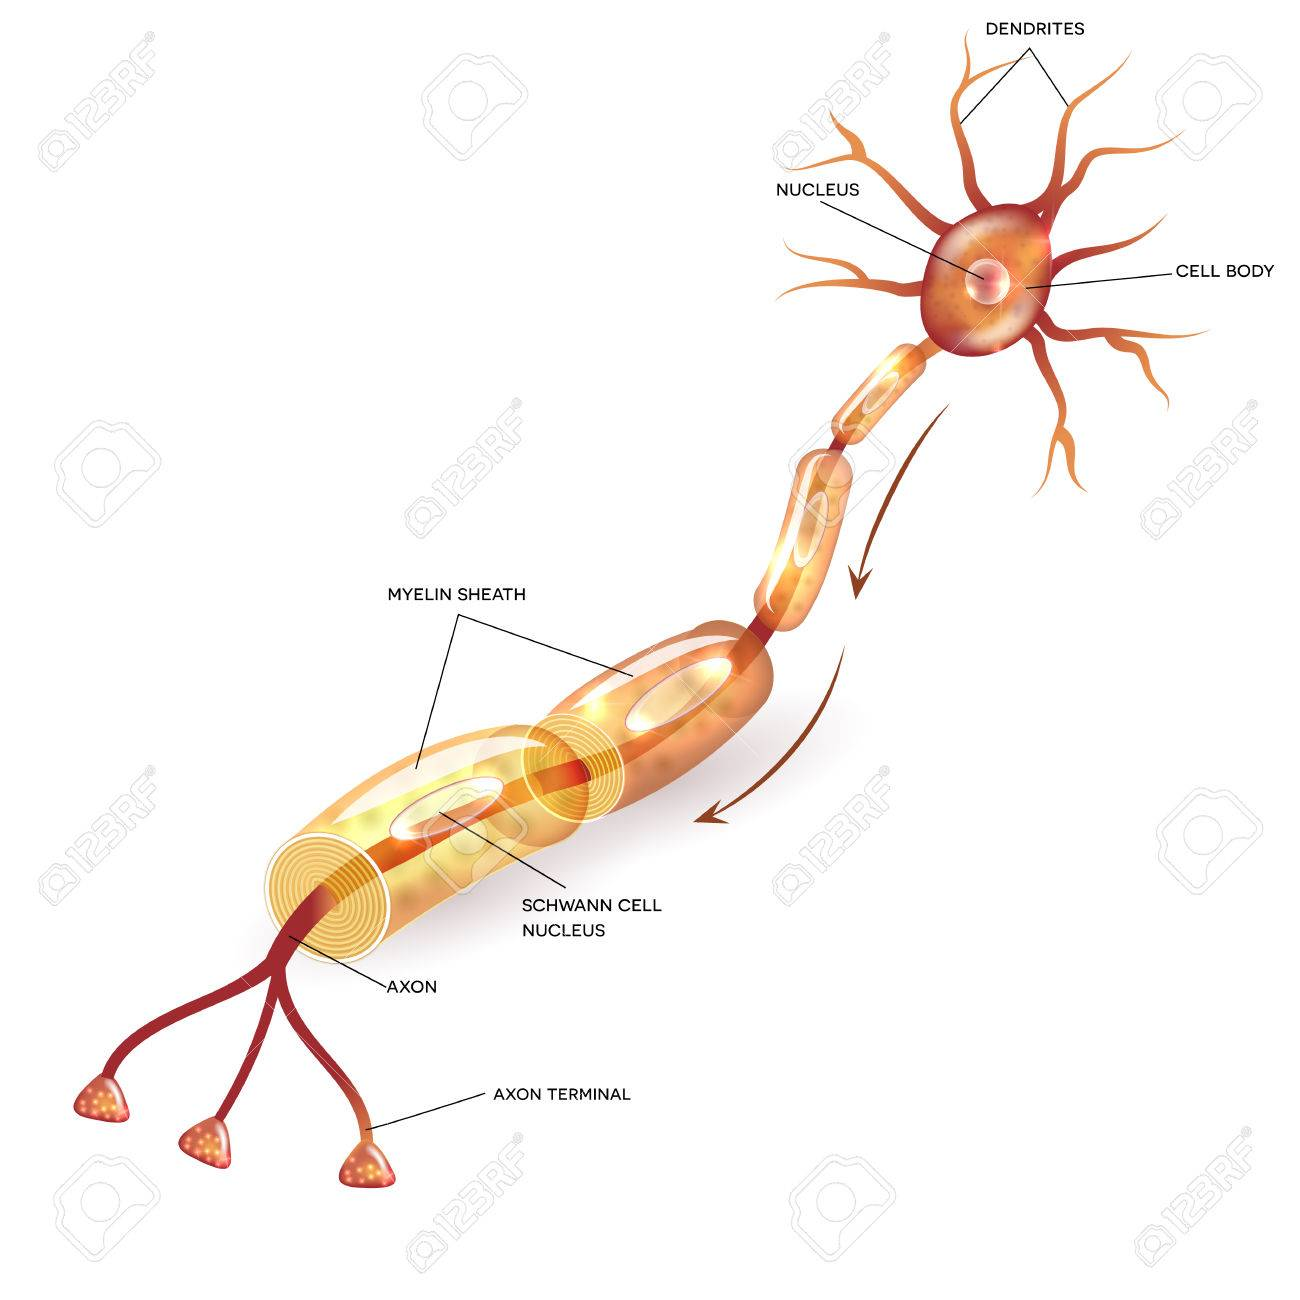 Neurona, Axón De Células Nerviosas Y La Envoltura De Mielina ...